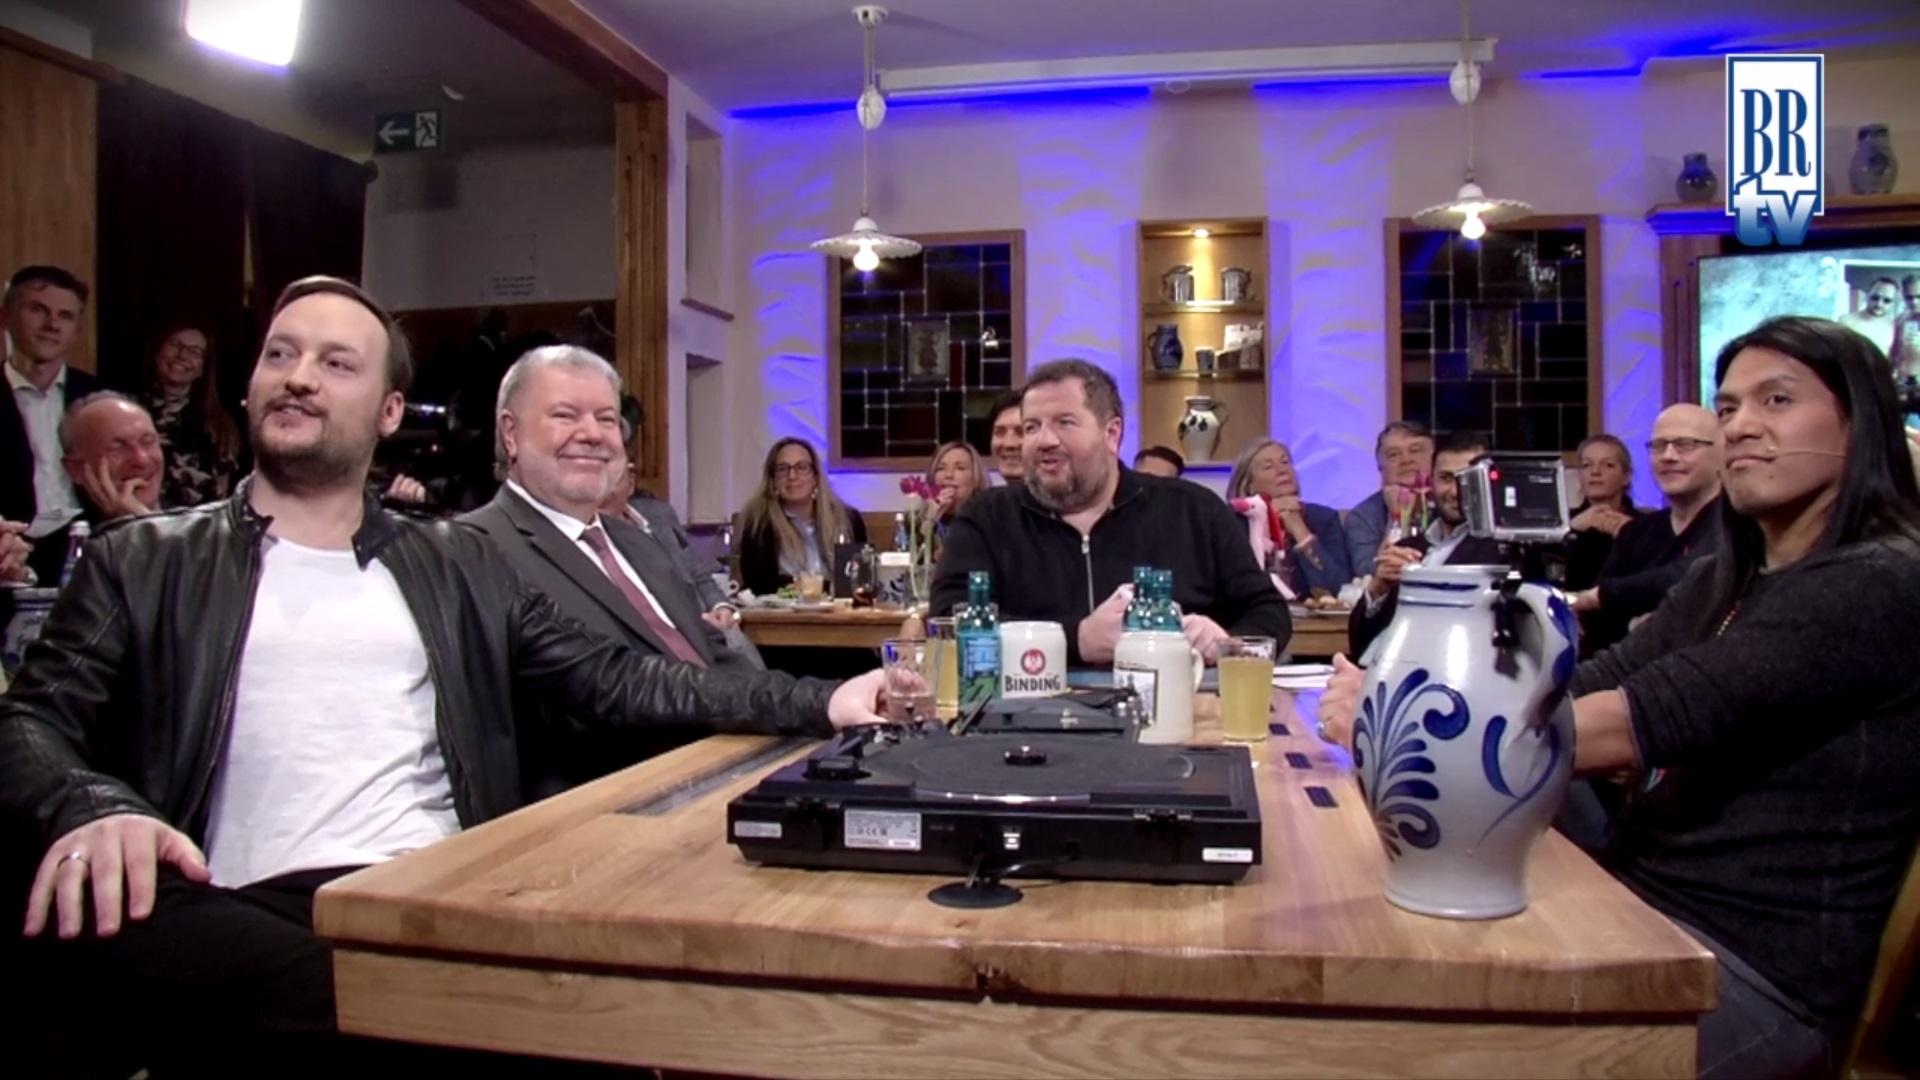 Bembel & Gebabbel – Folge 31 mit Kurt Beck, Felix Moese & Leo Rojasb